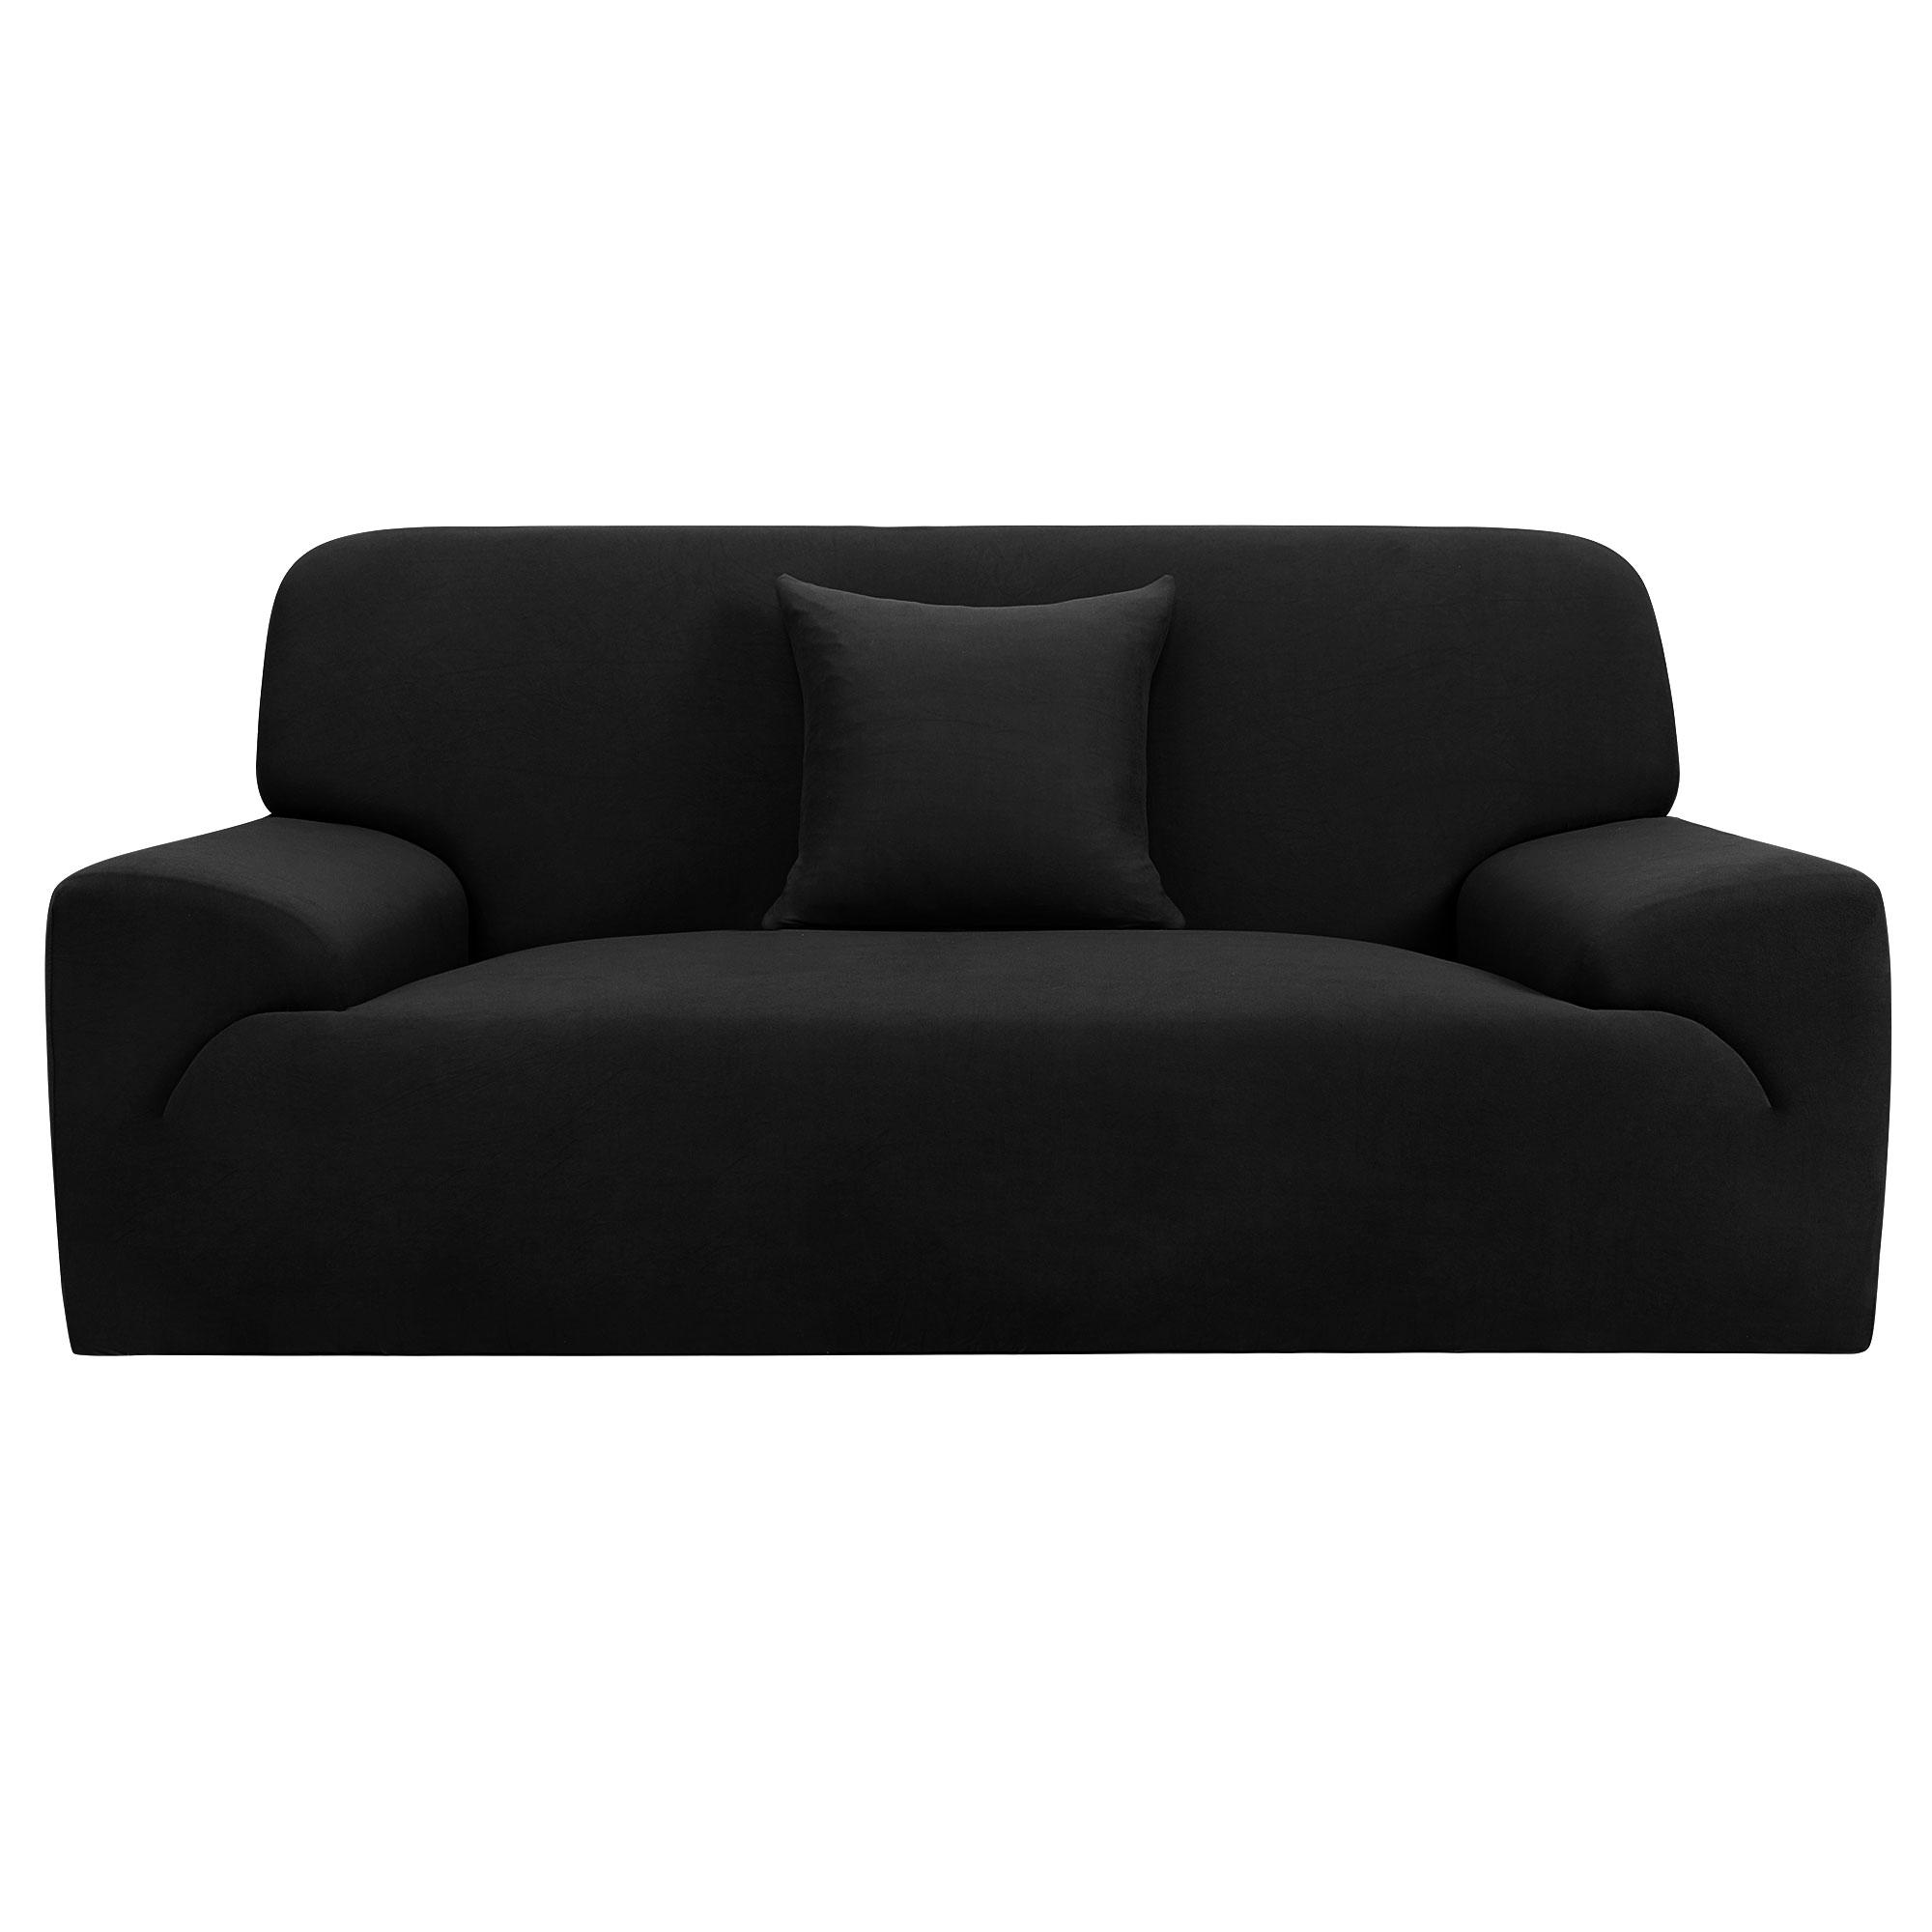 Furniture Sofa Loveseat Stretch Cover Slipcover Protector Black 55''-74''